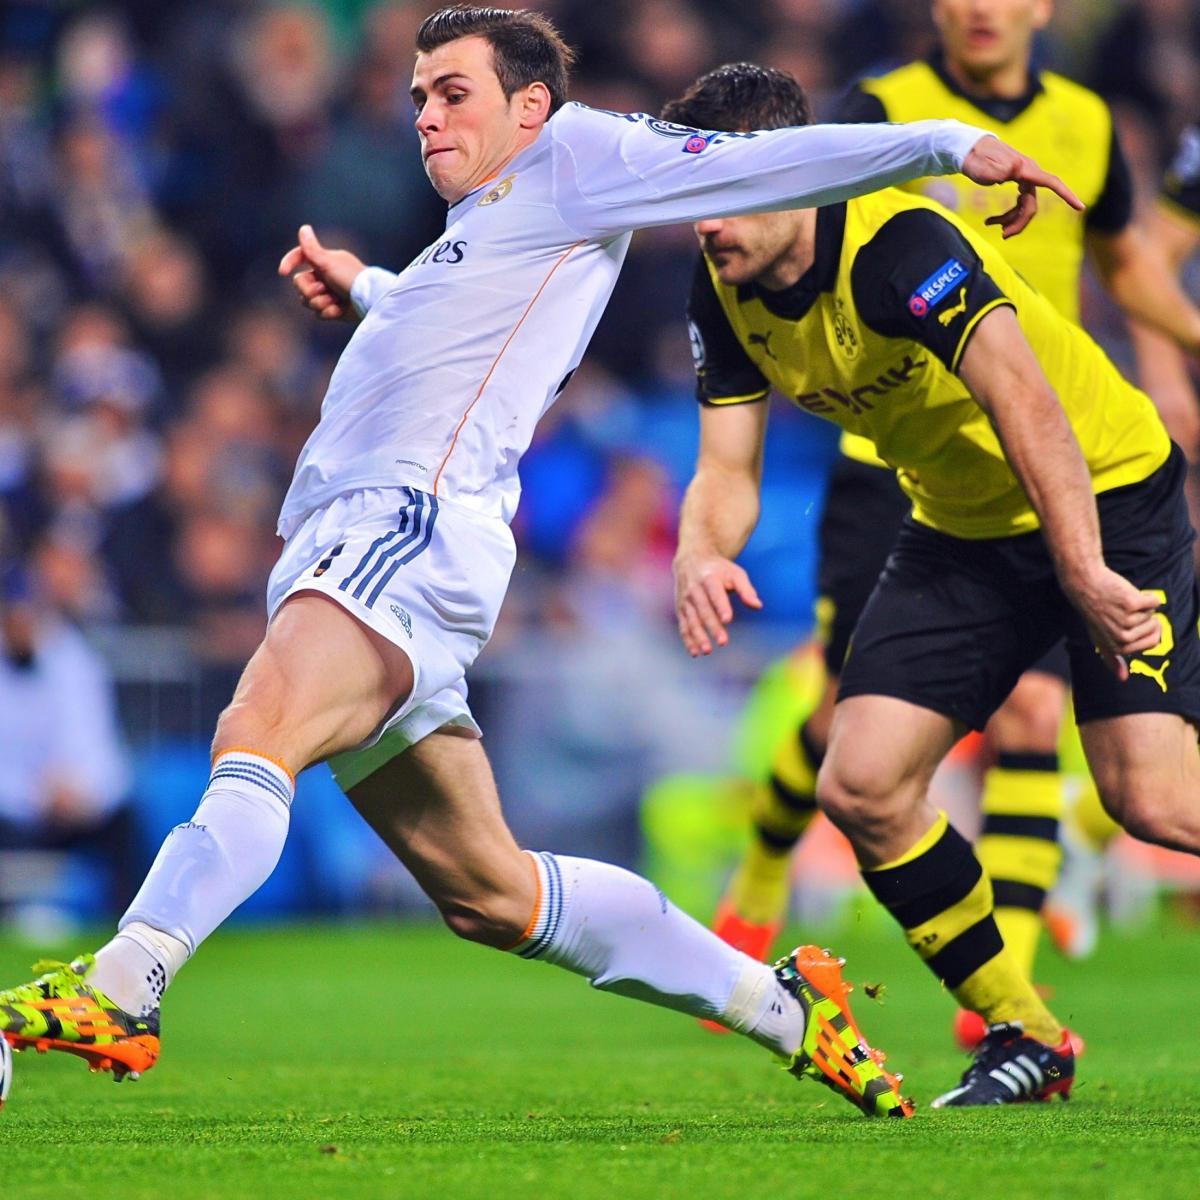 Psg Vs Manchester City Live Score Highlights From: Real Madrid V Borussia Dortmund: Champions League Live